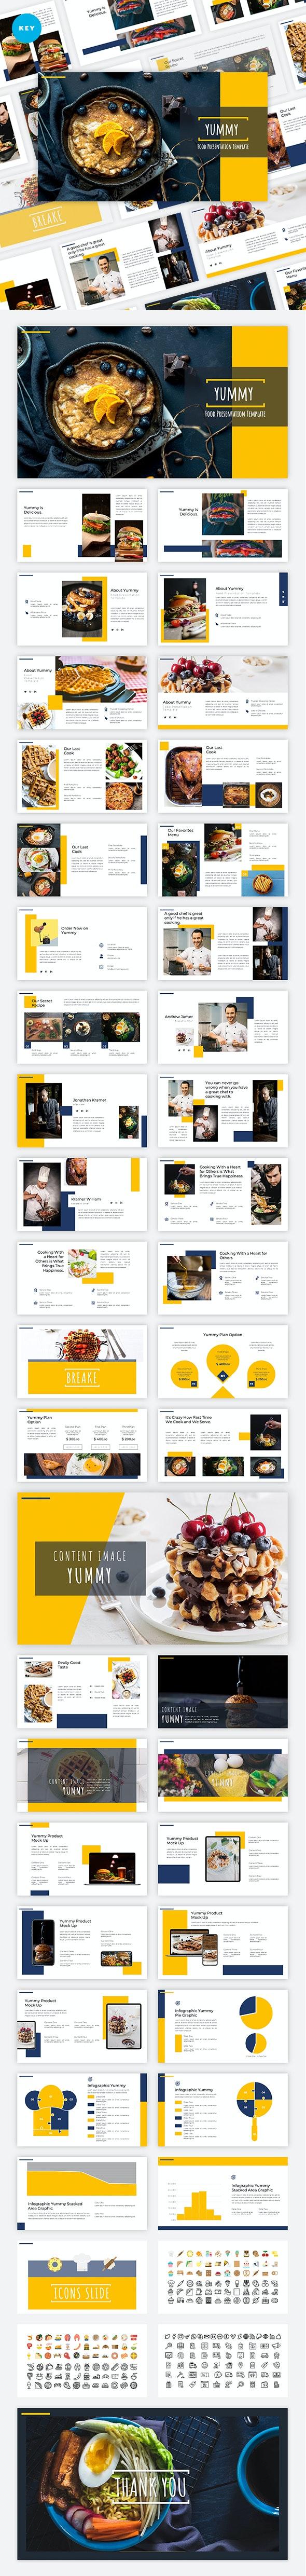 Yummy - Food Keynote Template - Creative Keynote Templates